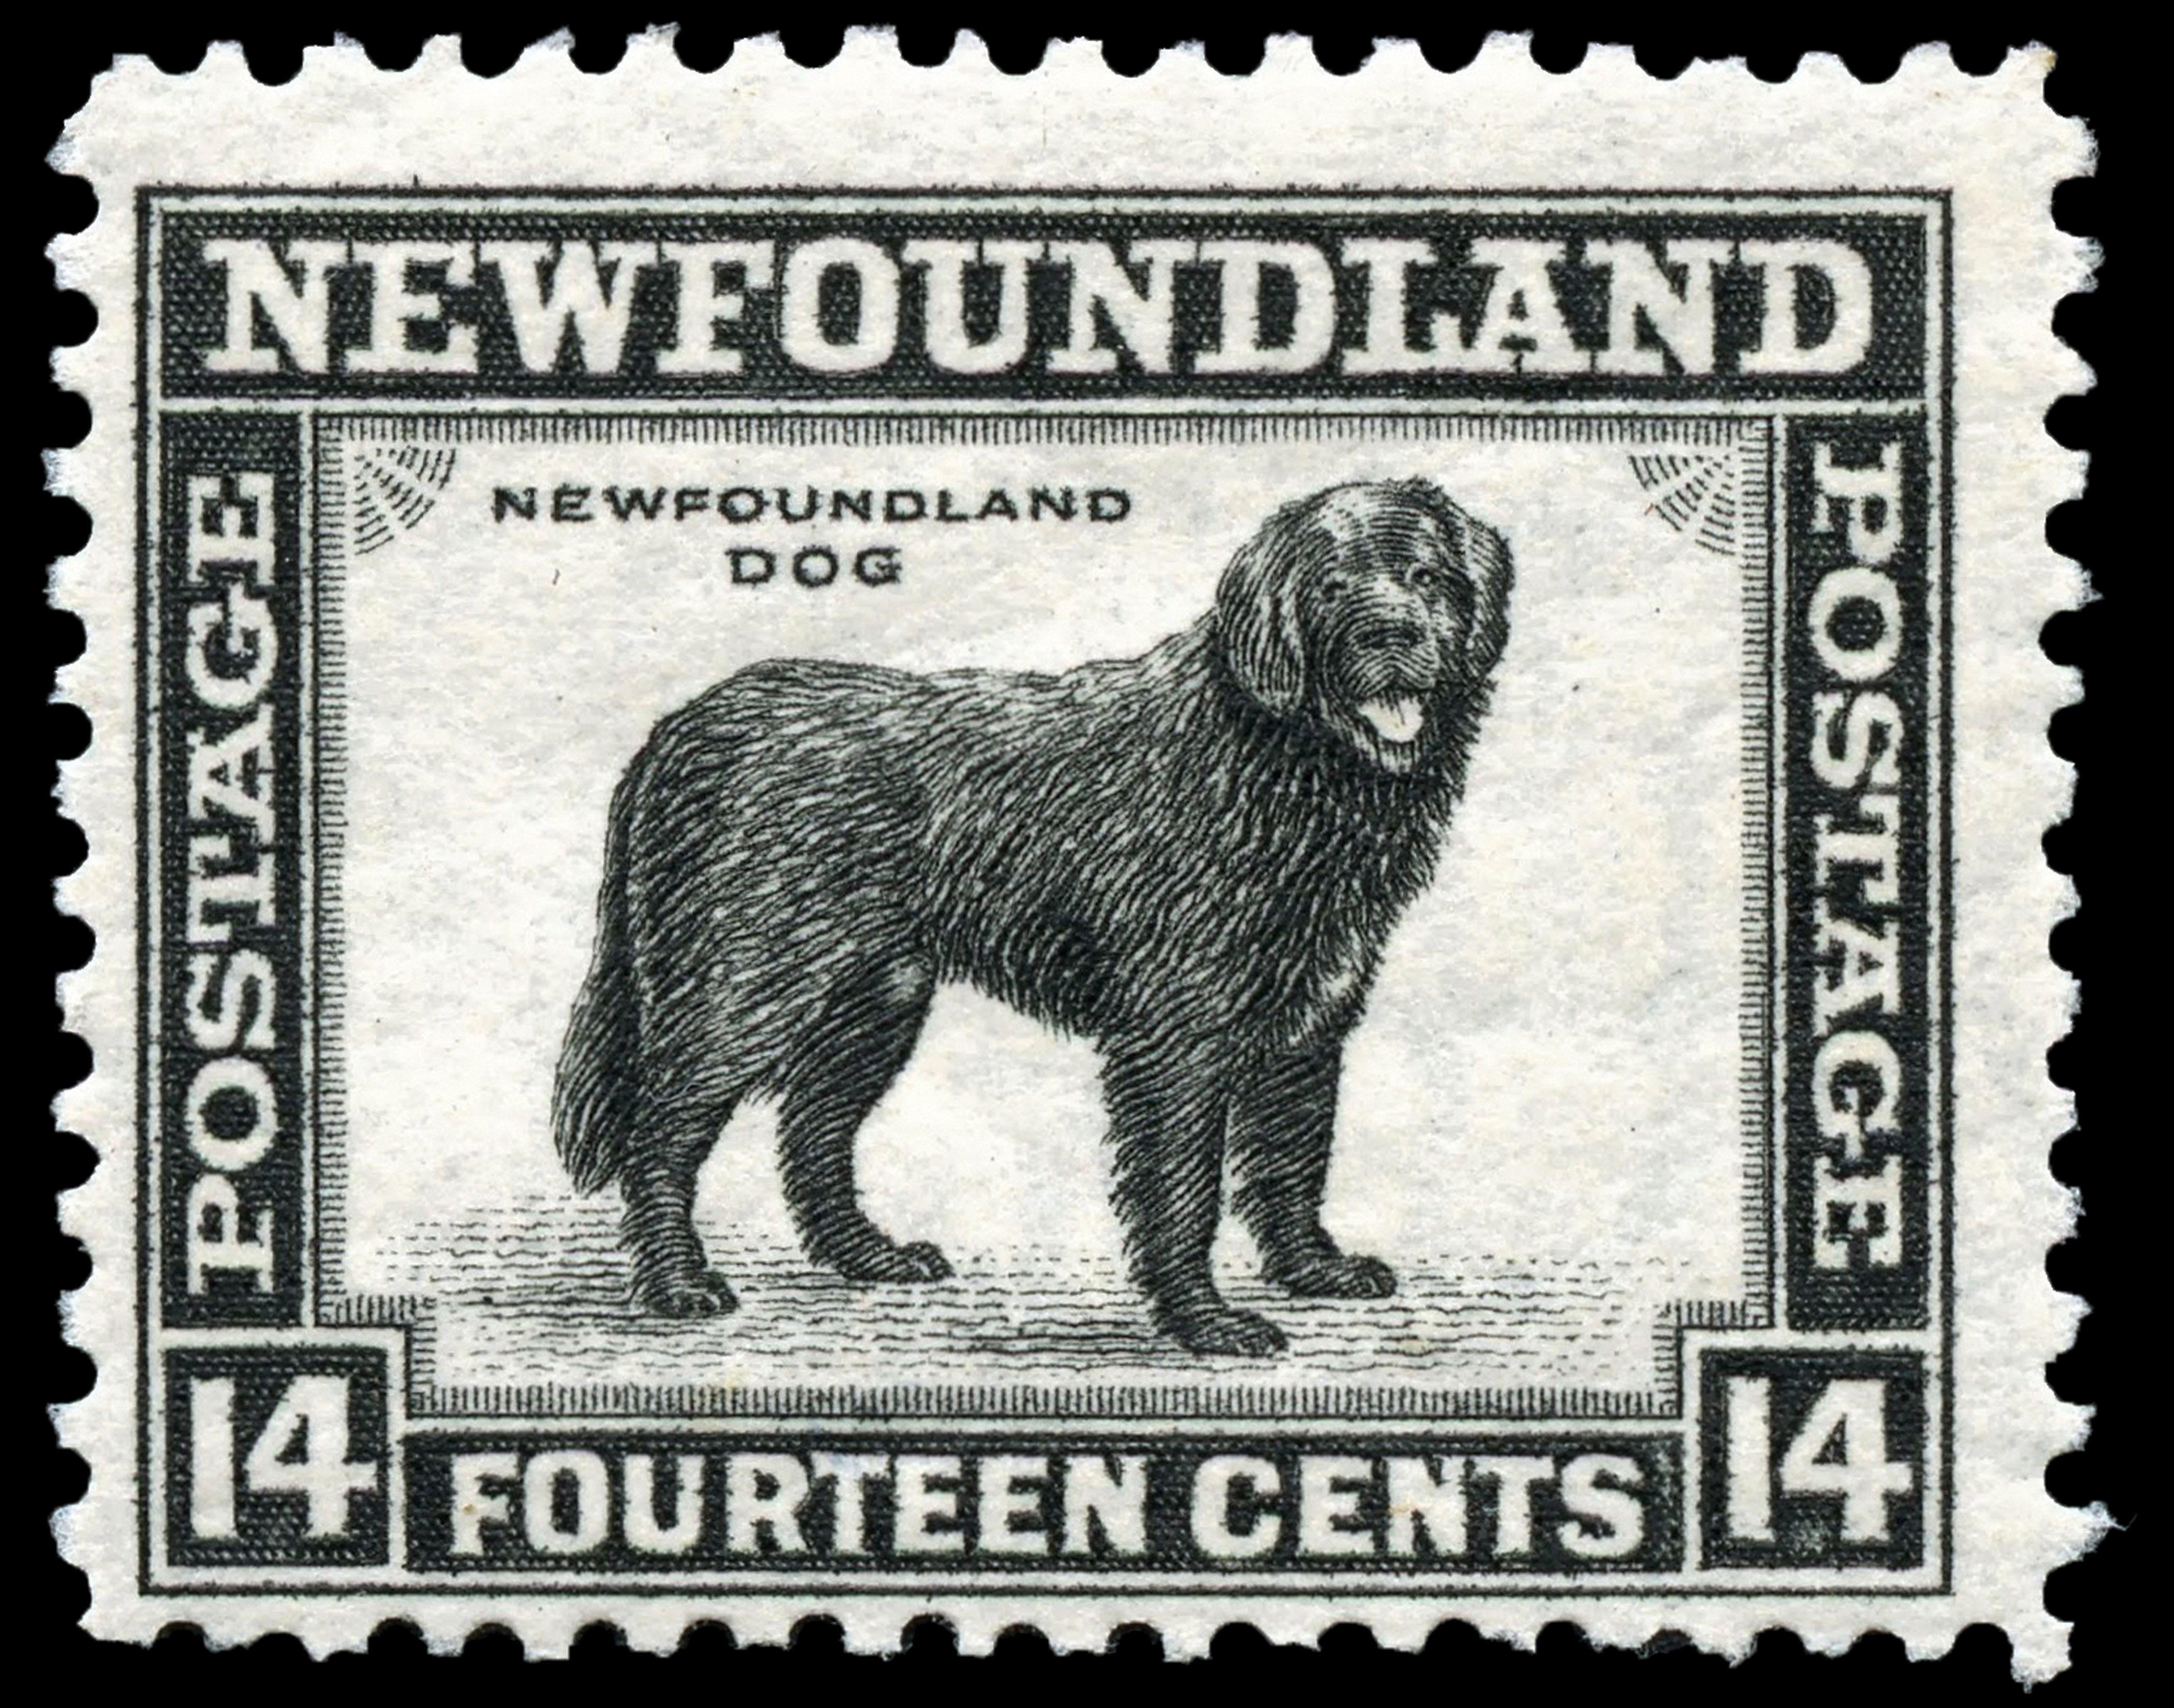 Canvas Print Vintage Newfoundland Stamp 11 X 14 Newfoundland Dog Newfoundland Dog Newfoundland Black Dog